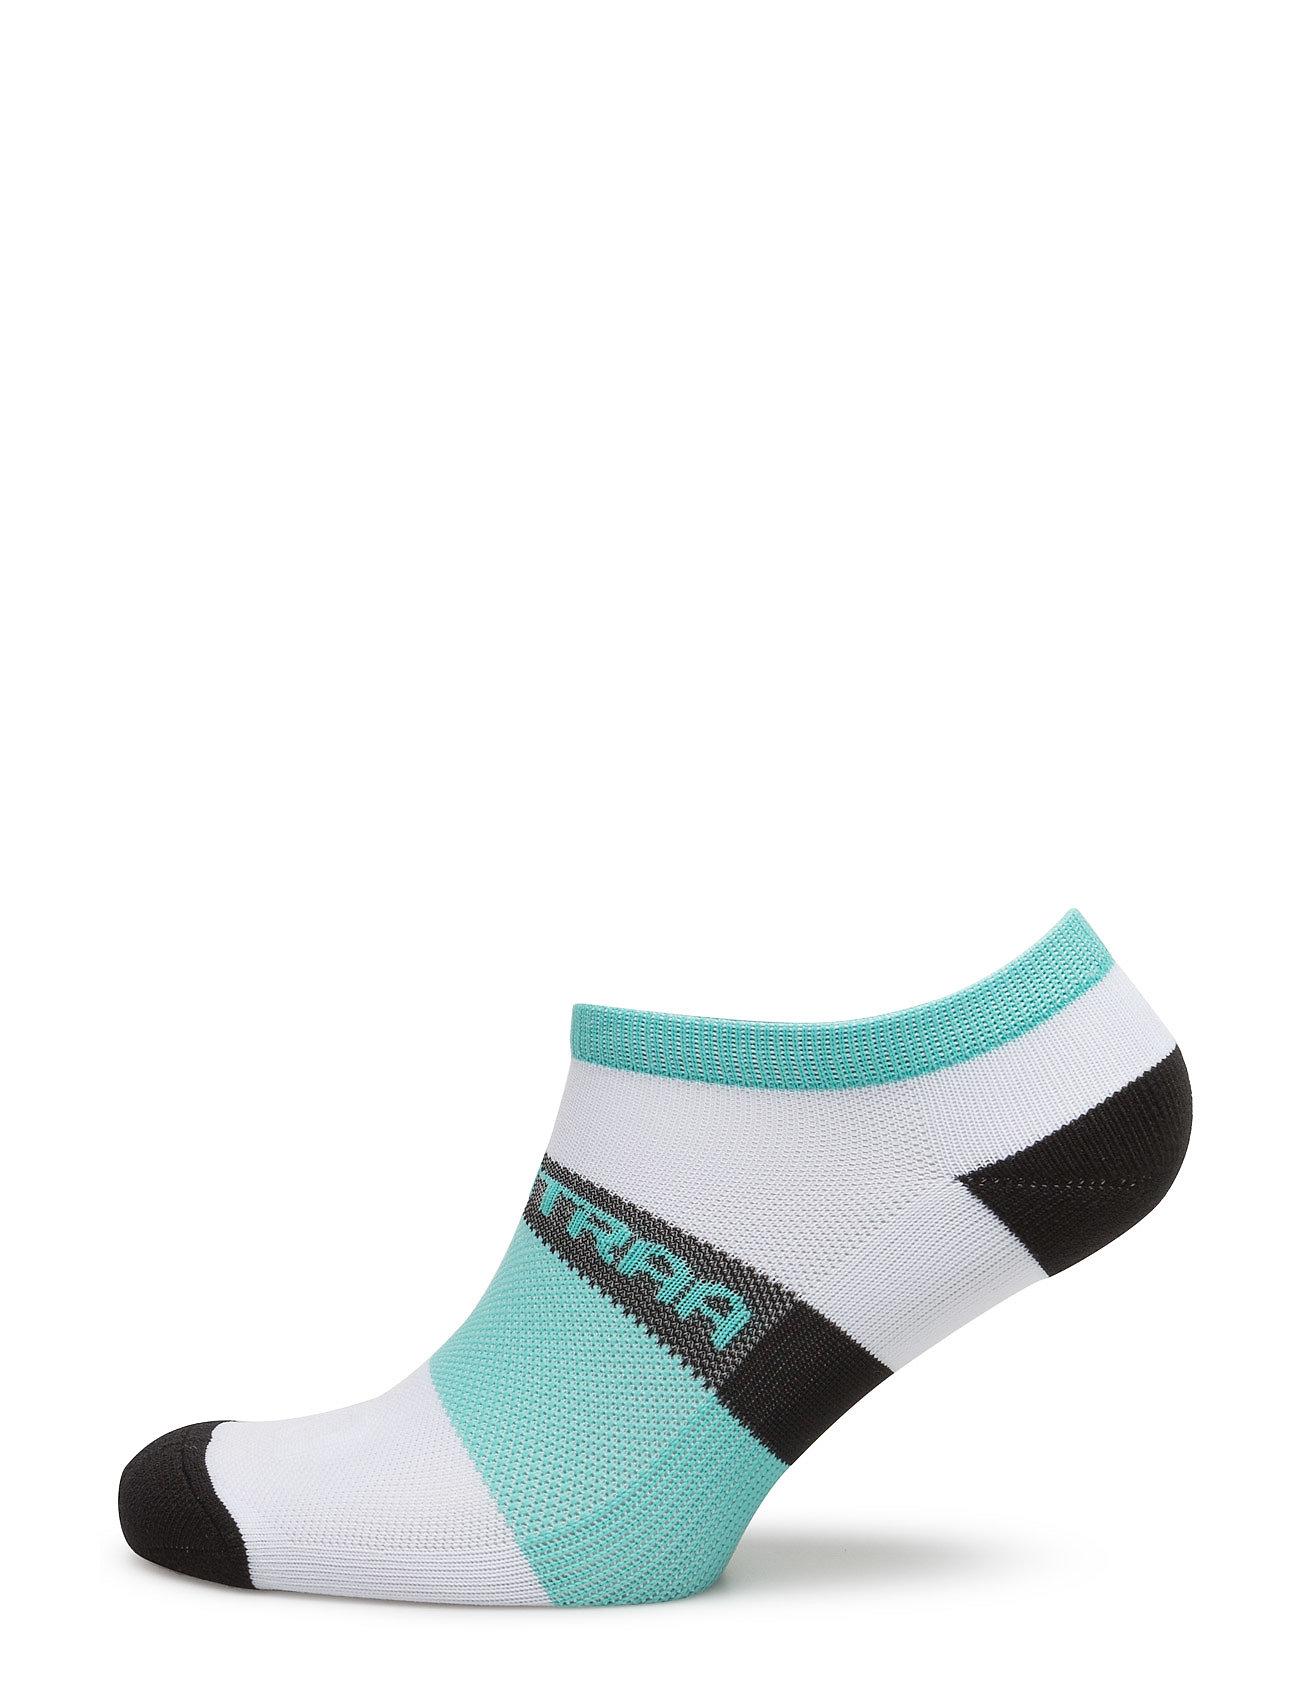 TÅ Sock Kari Traa Sports undertøj til Kvinder i